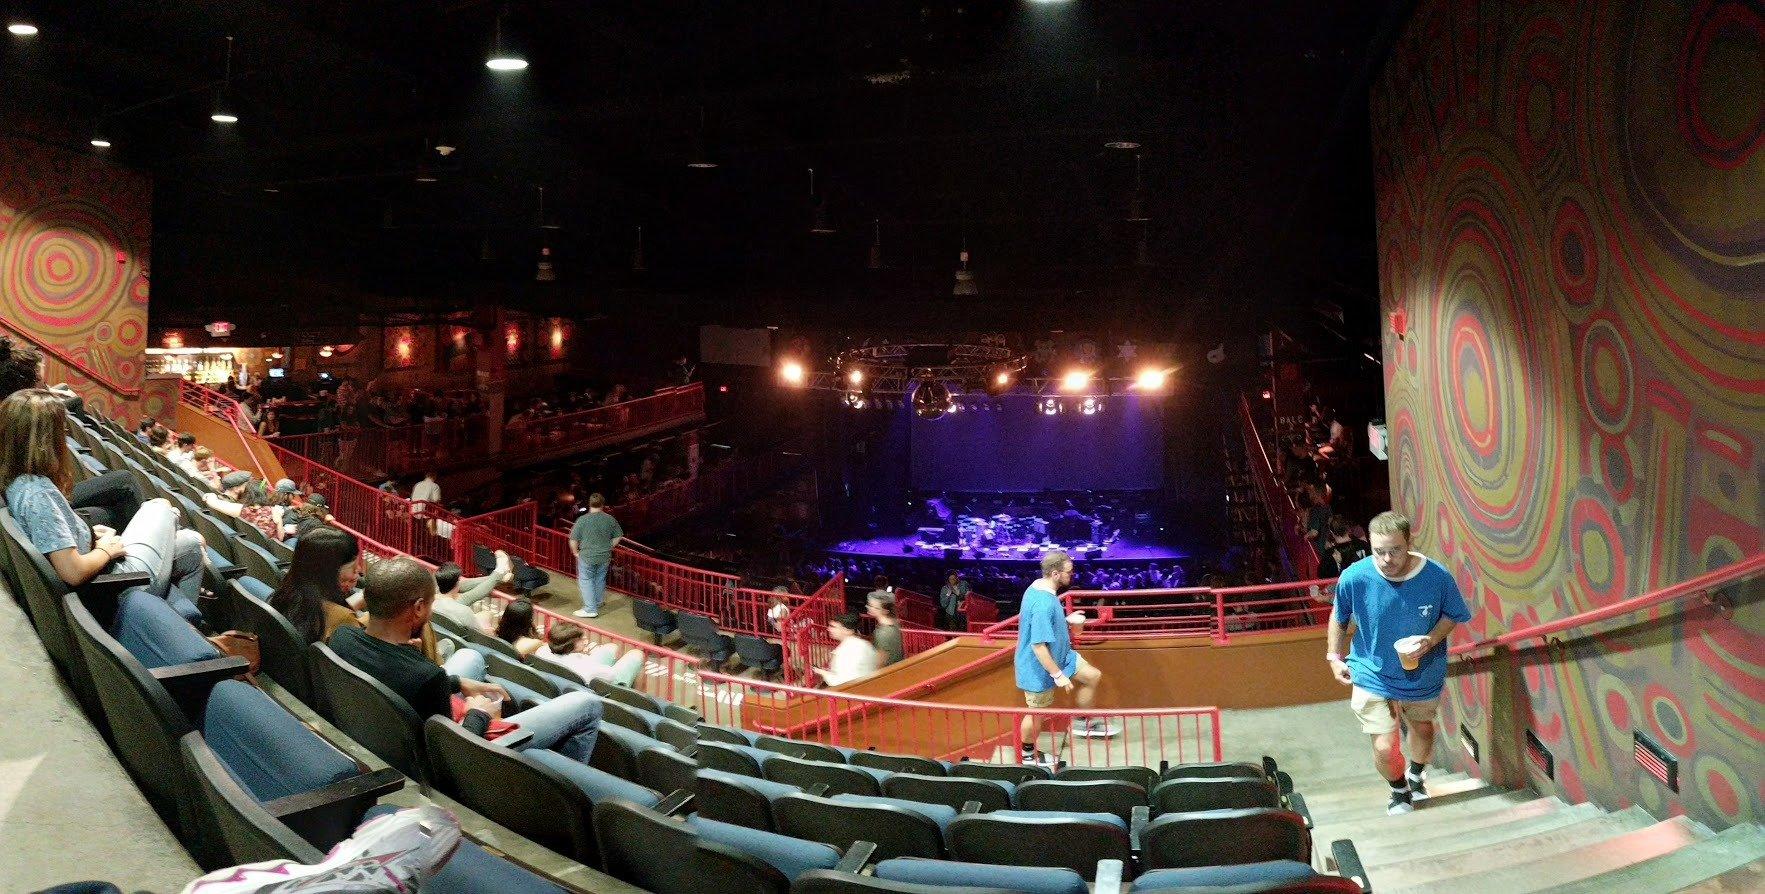 House Of Blues - Boston Section Stadium (STADM) Row F Seat 301